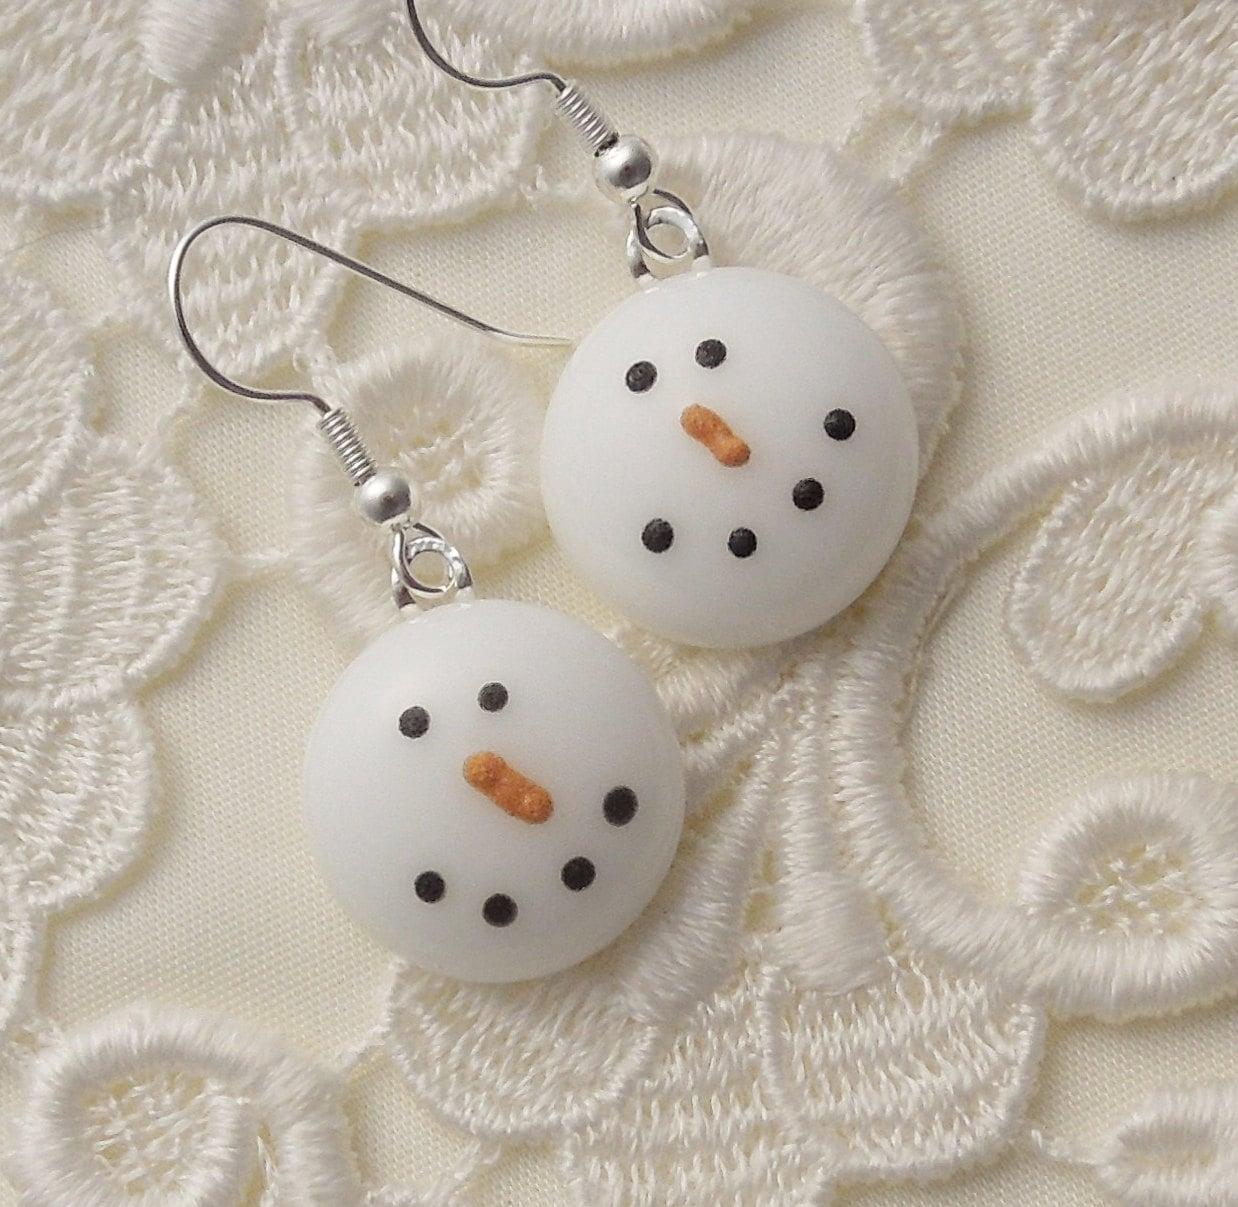 Snowman earrings fused glass christmas ornament